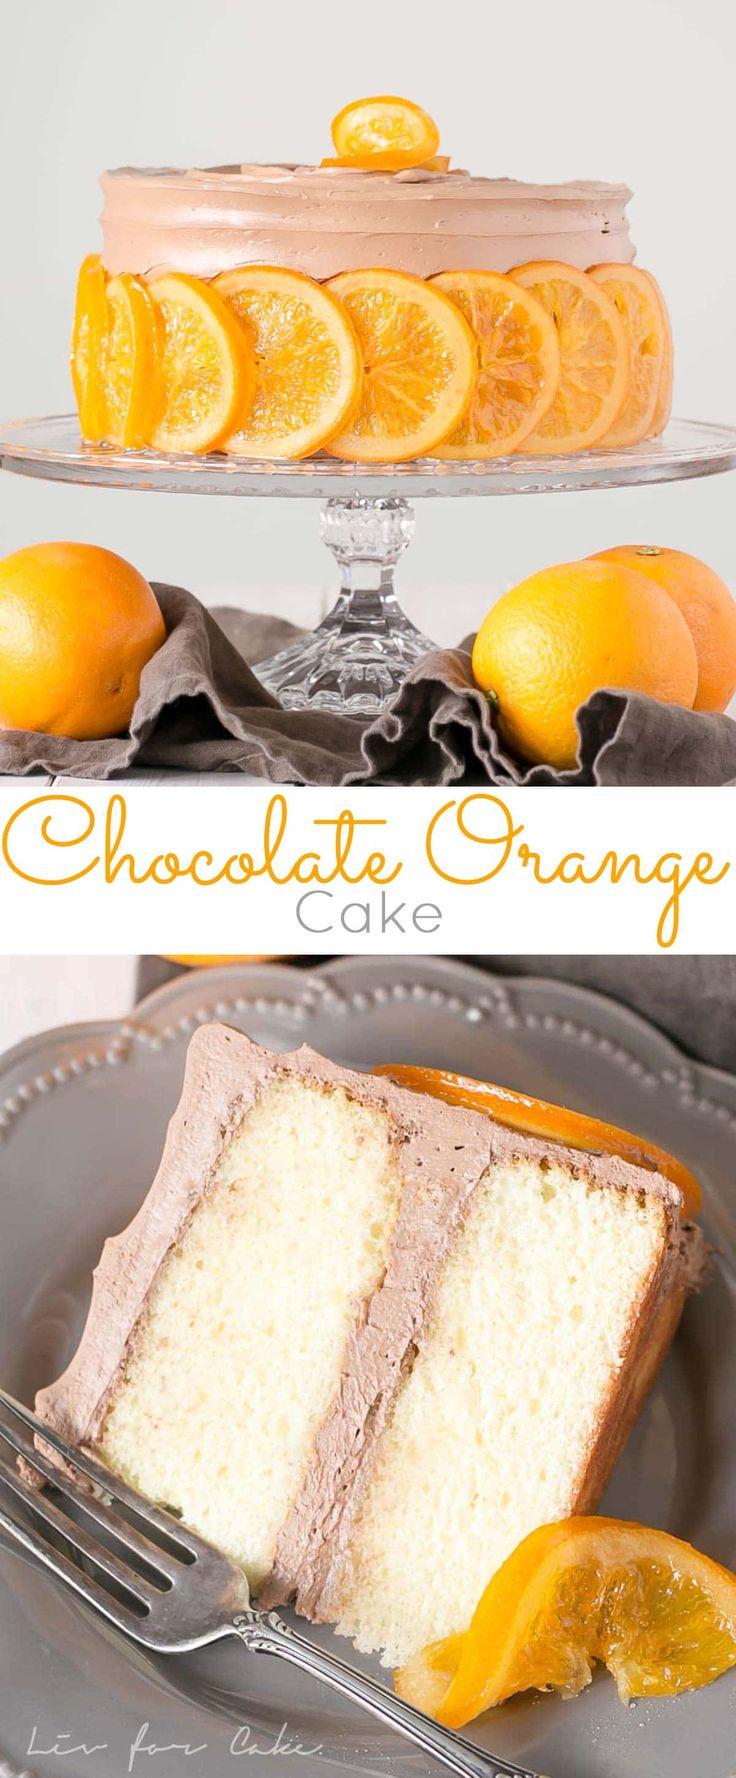 Chocolate Orange Cake! Orange infused cake layers with a silky chocolate buttercream. | livforcake.com